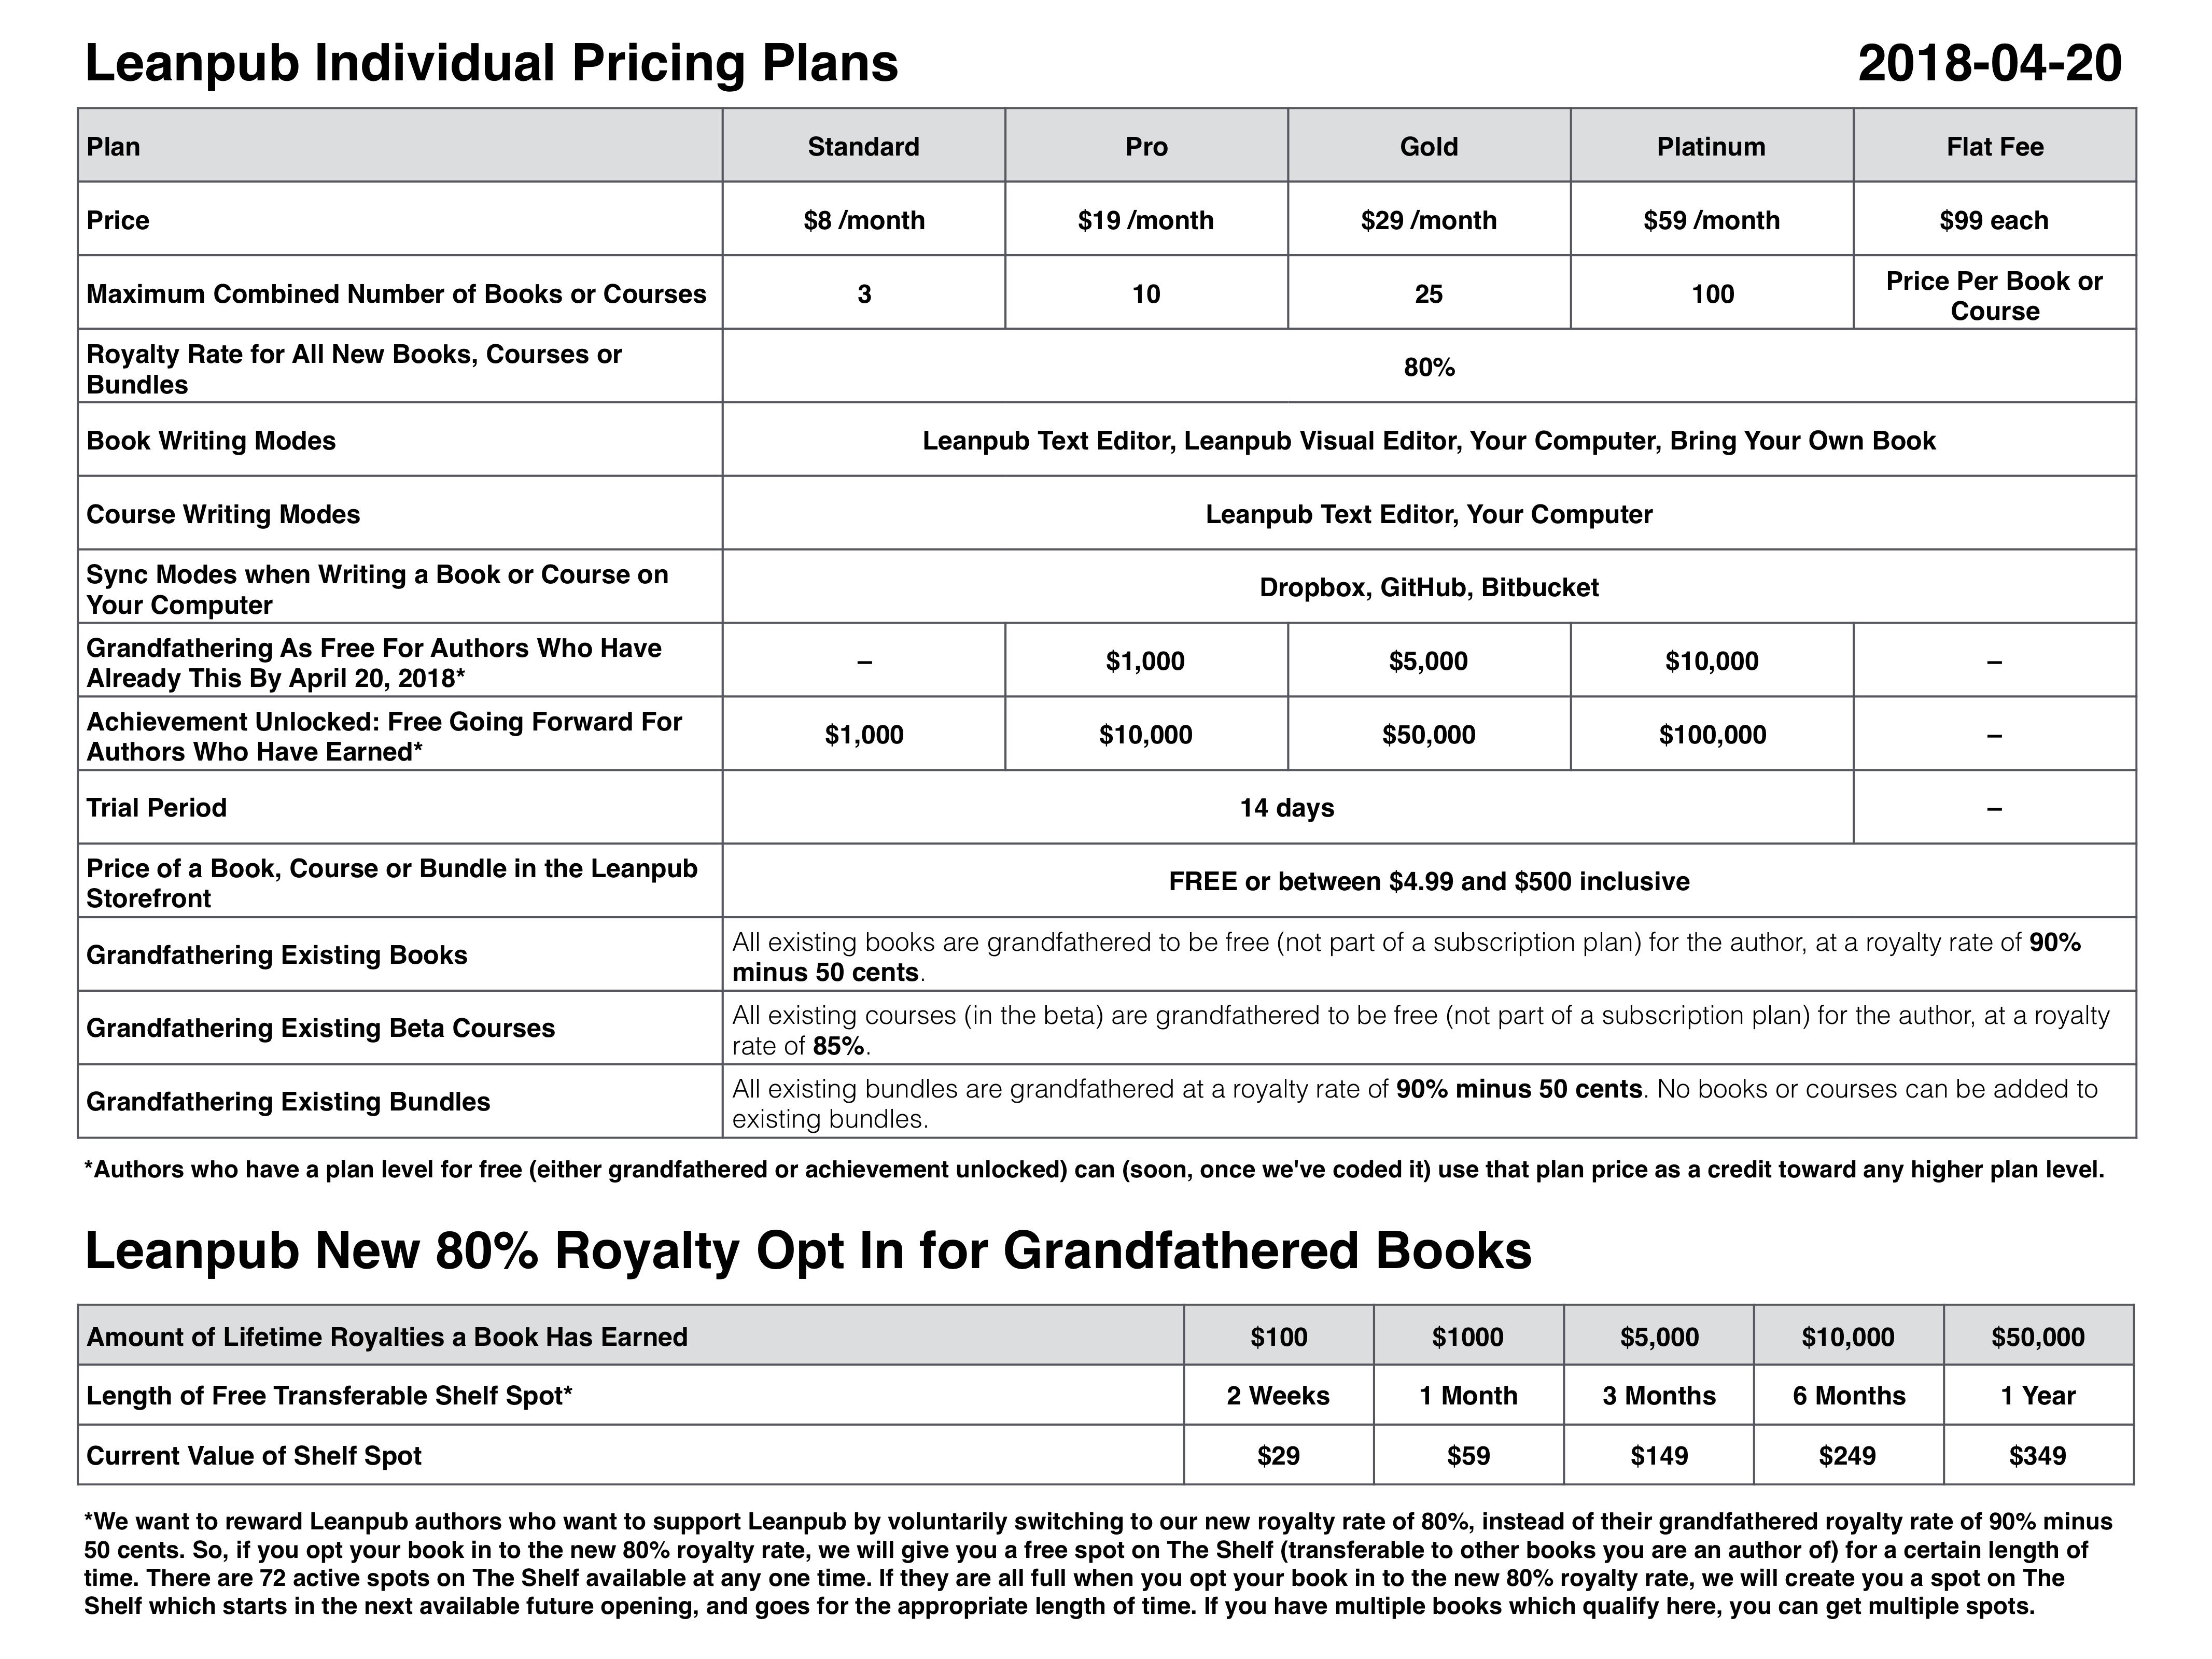 Leanpub Pricing Plans